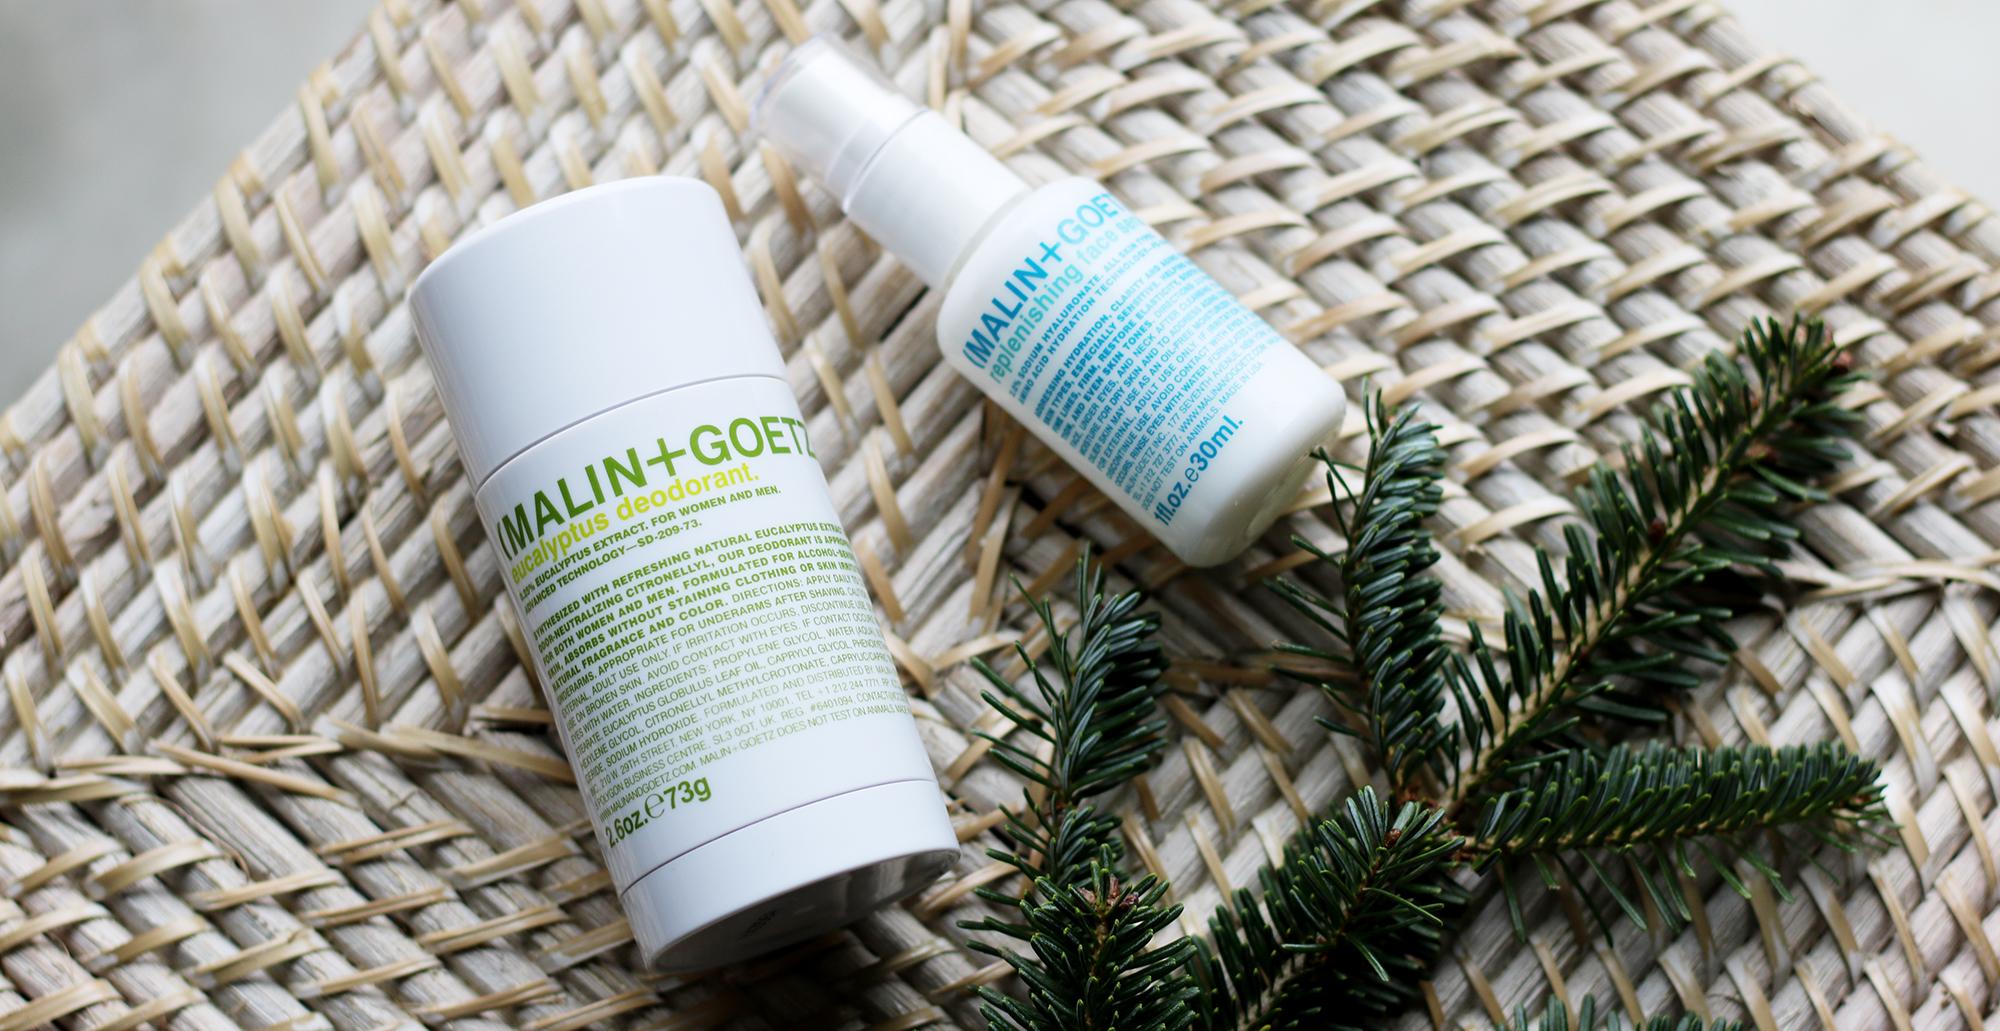 Malin + Goetz  deodorant  and  face serum